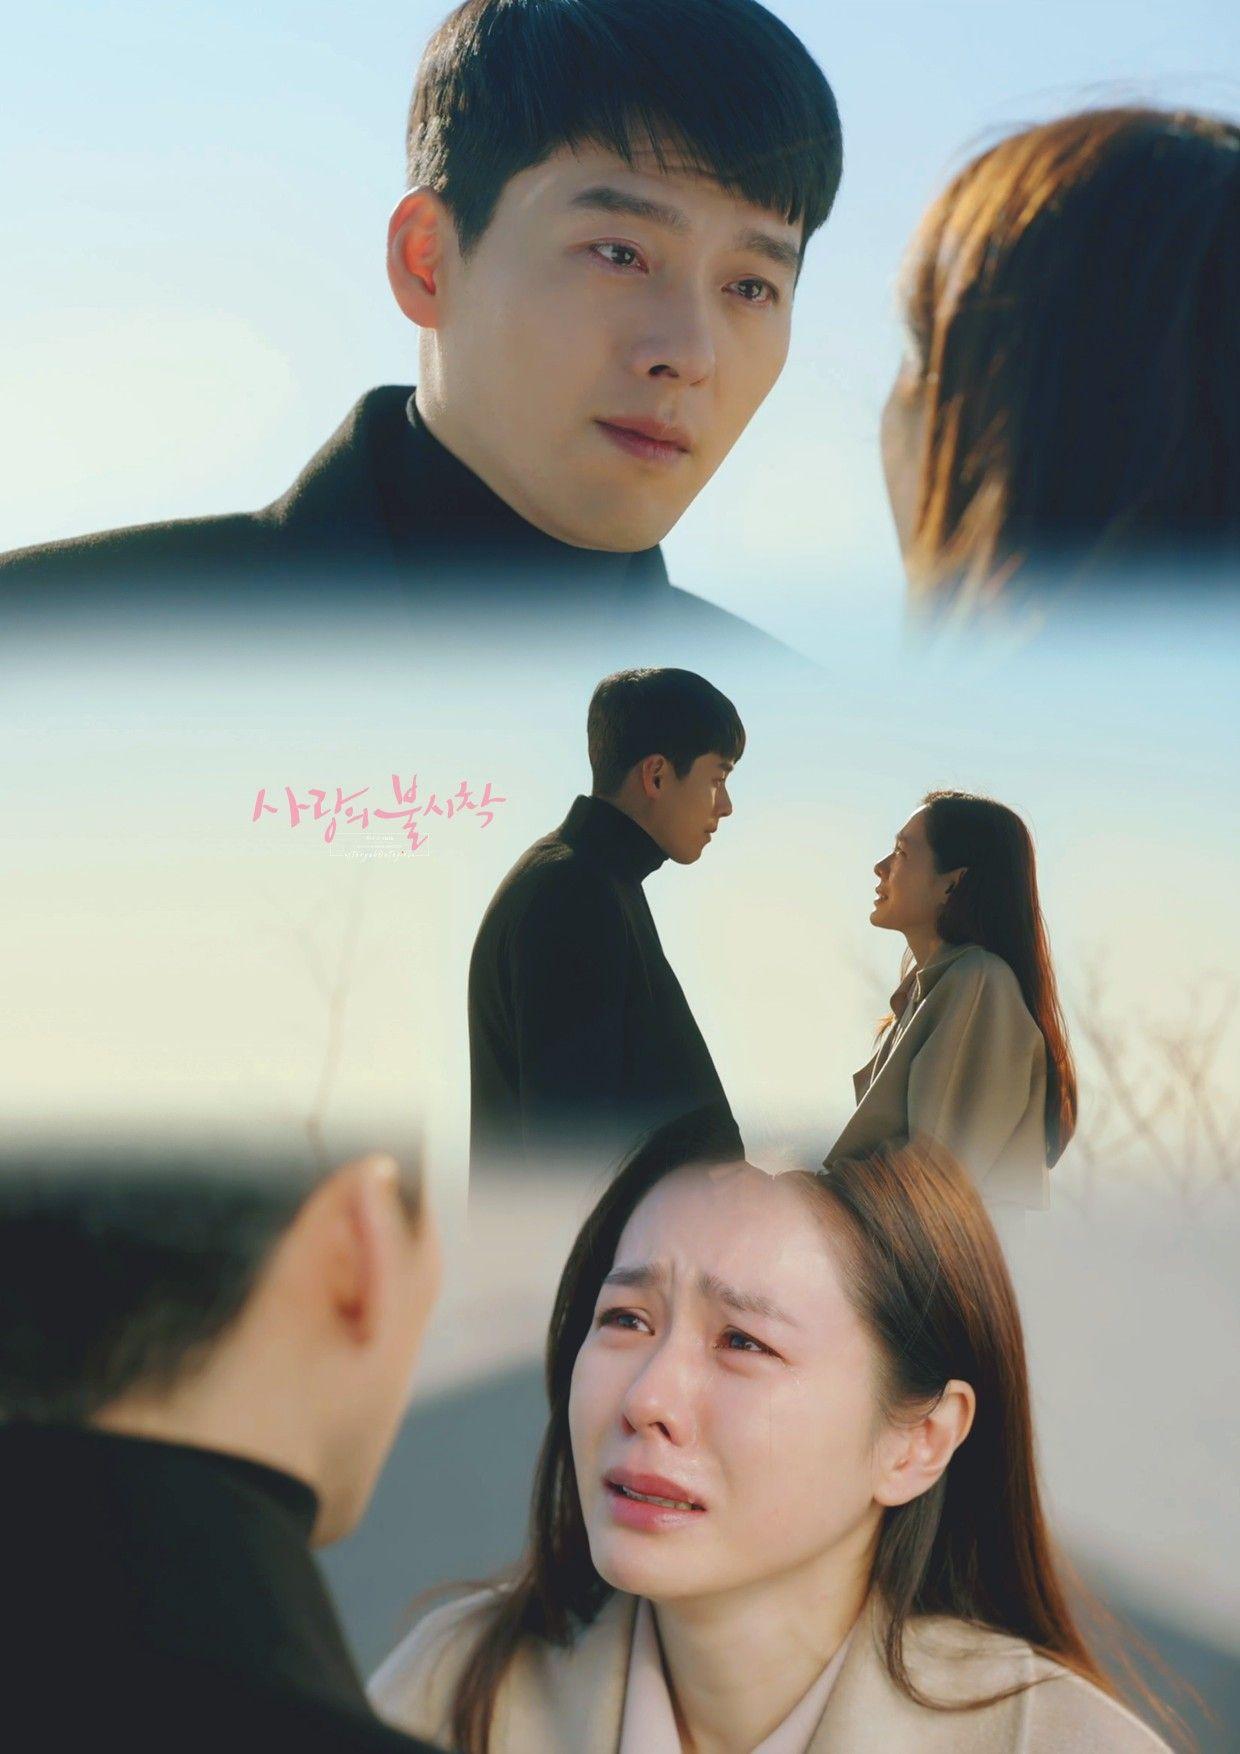 Pin by Relax on Amazing K-dramas in 2020 | Hyun bin ...